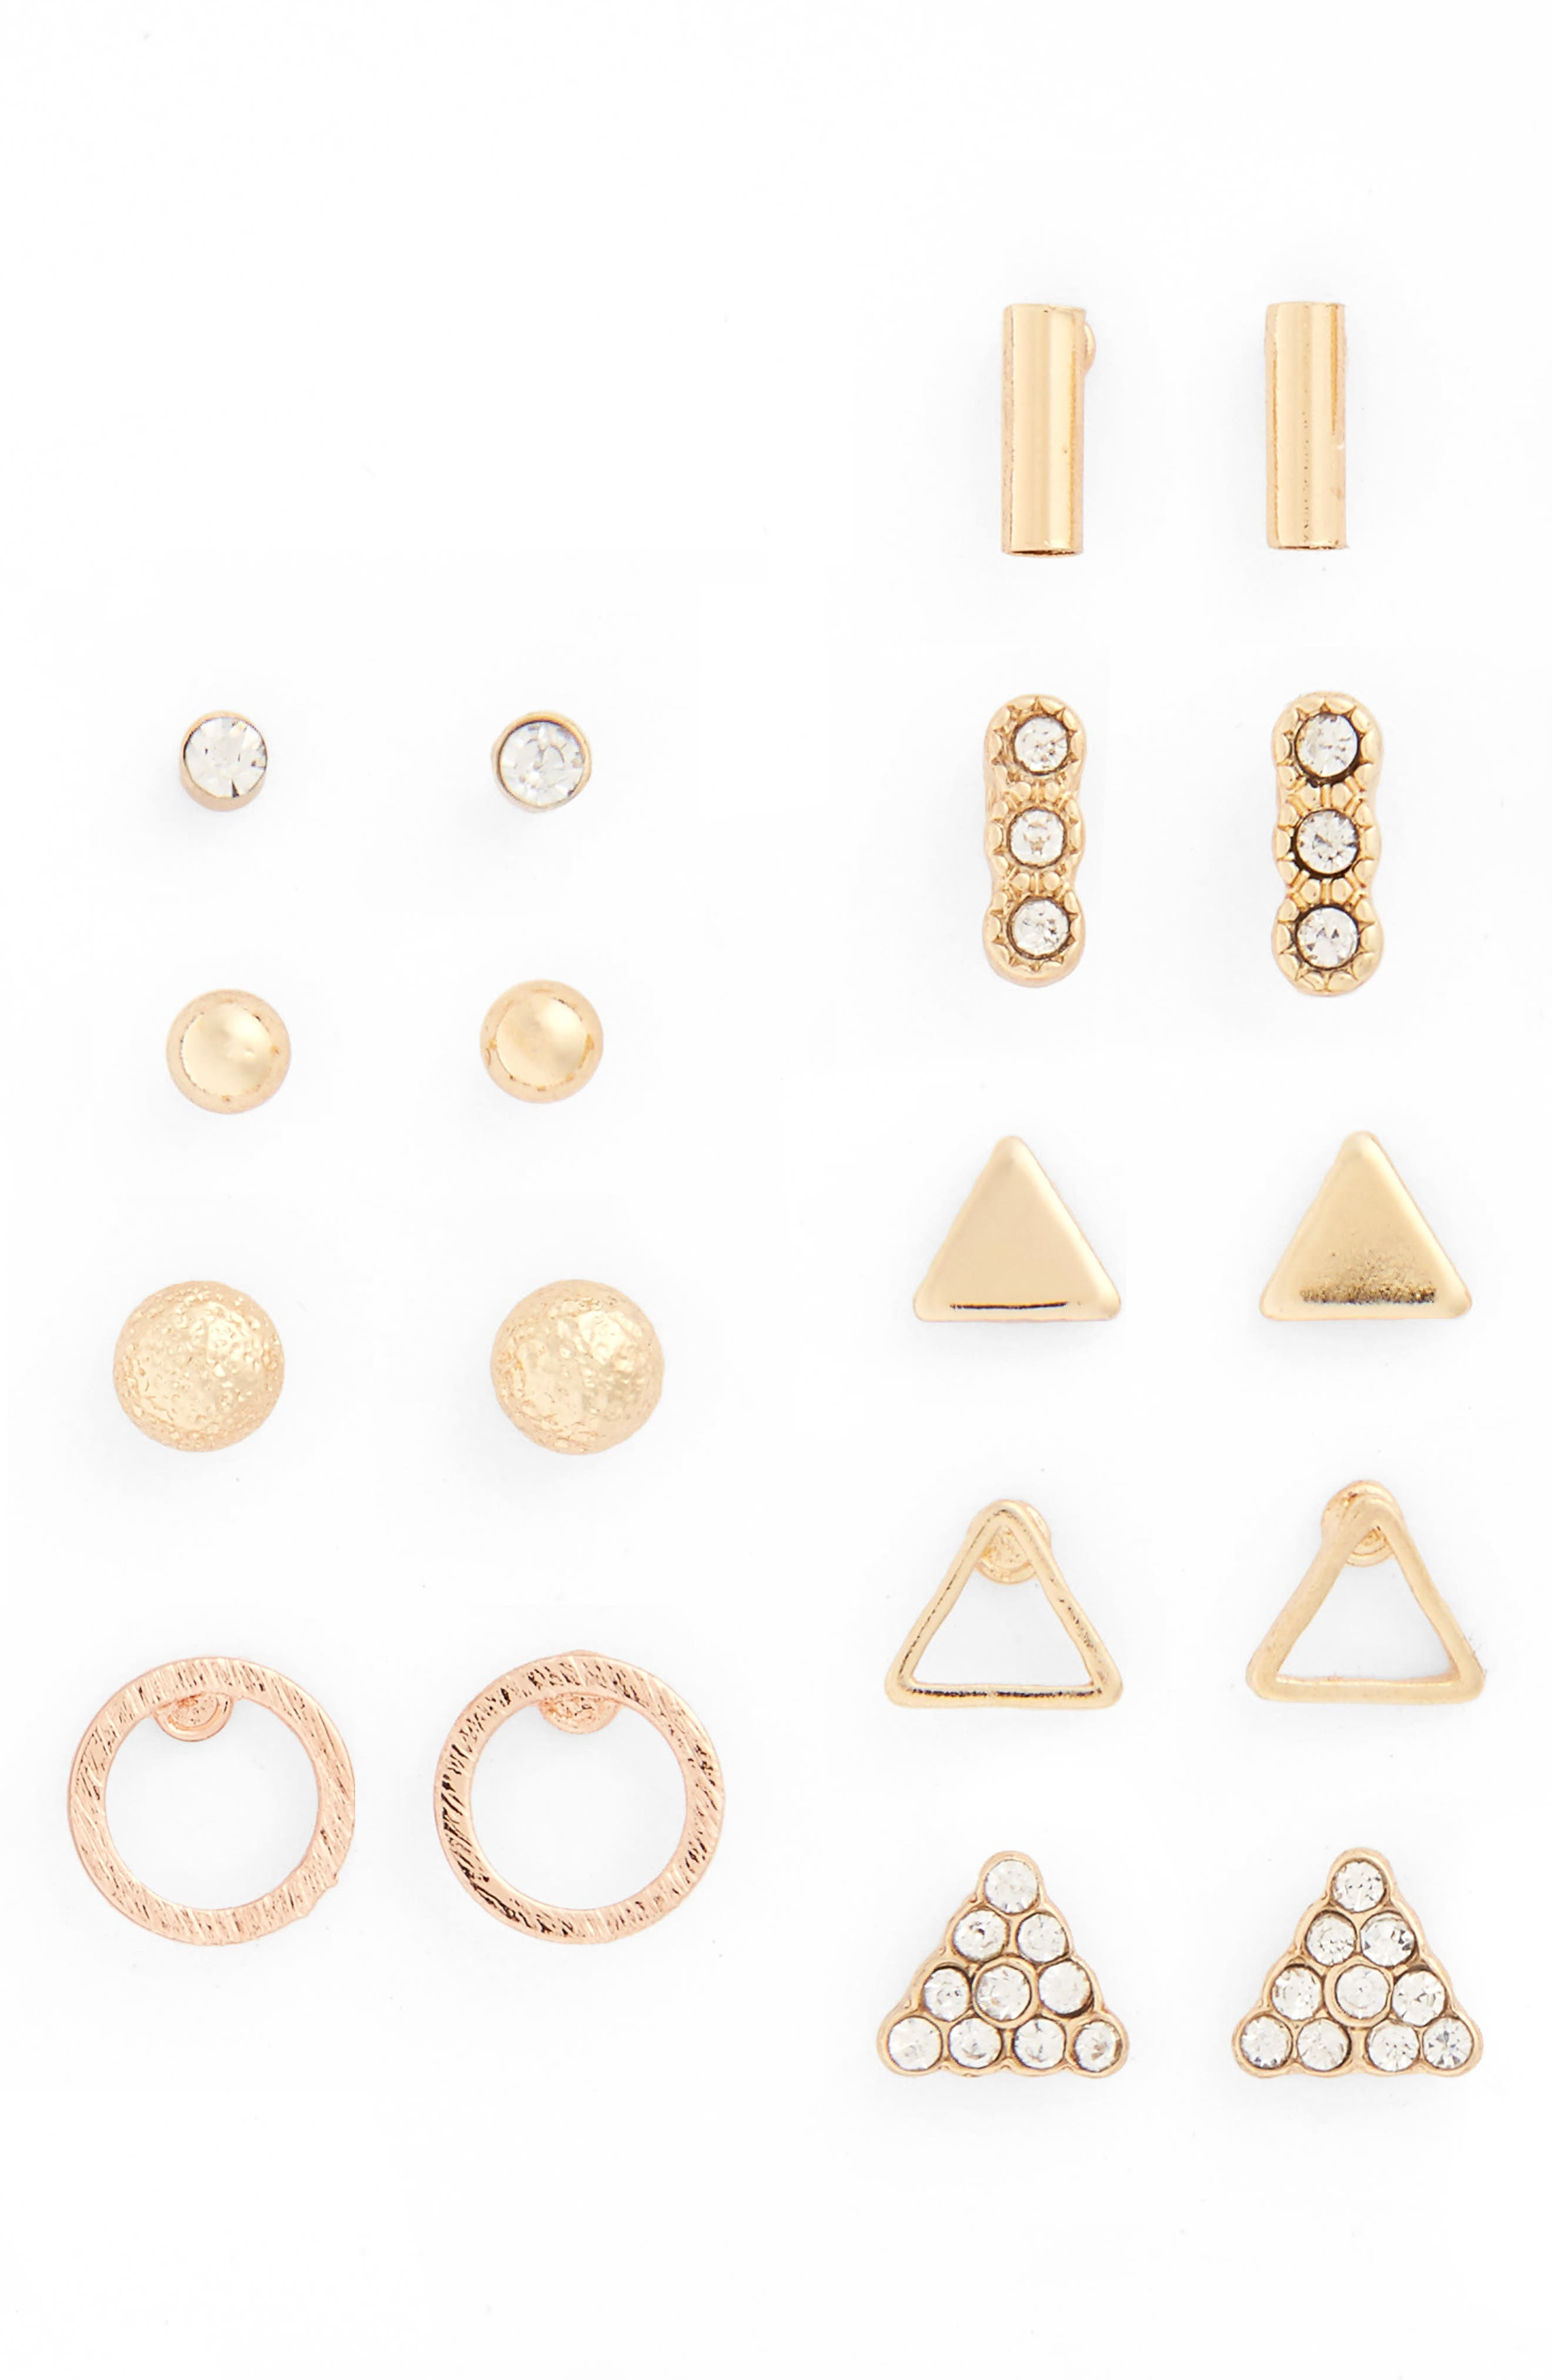 9-Pack Geo Stud Earrings,                             Main thumbnail 1, color,                             710